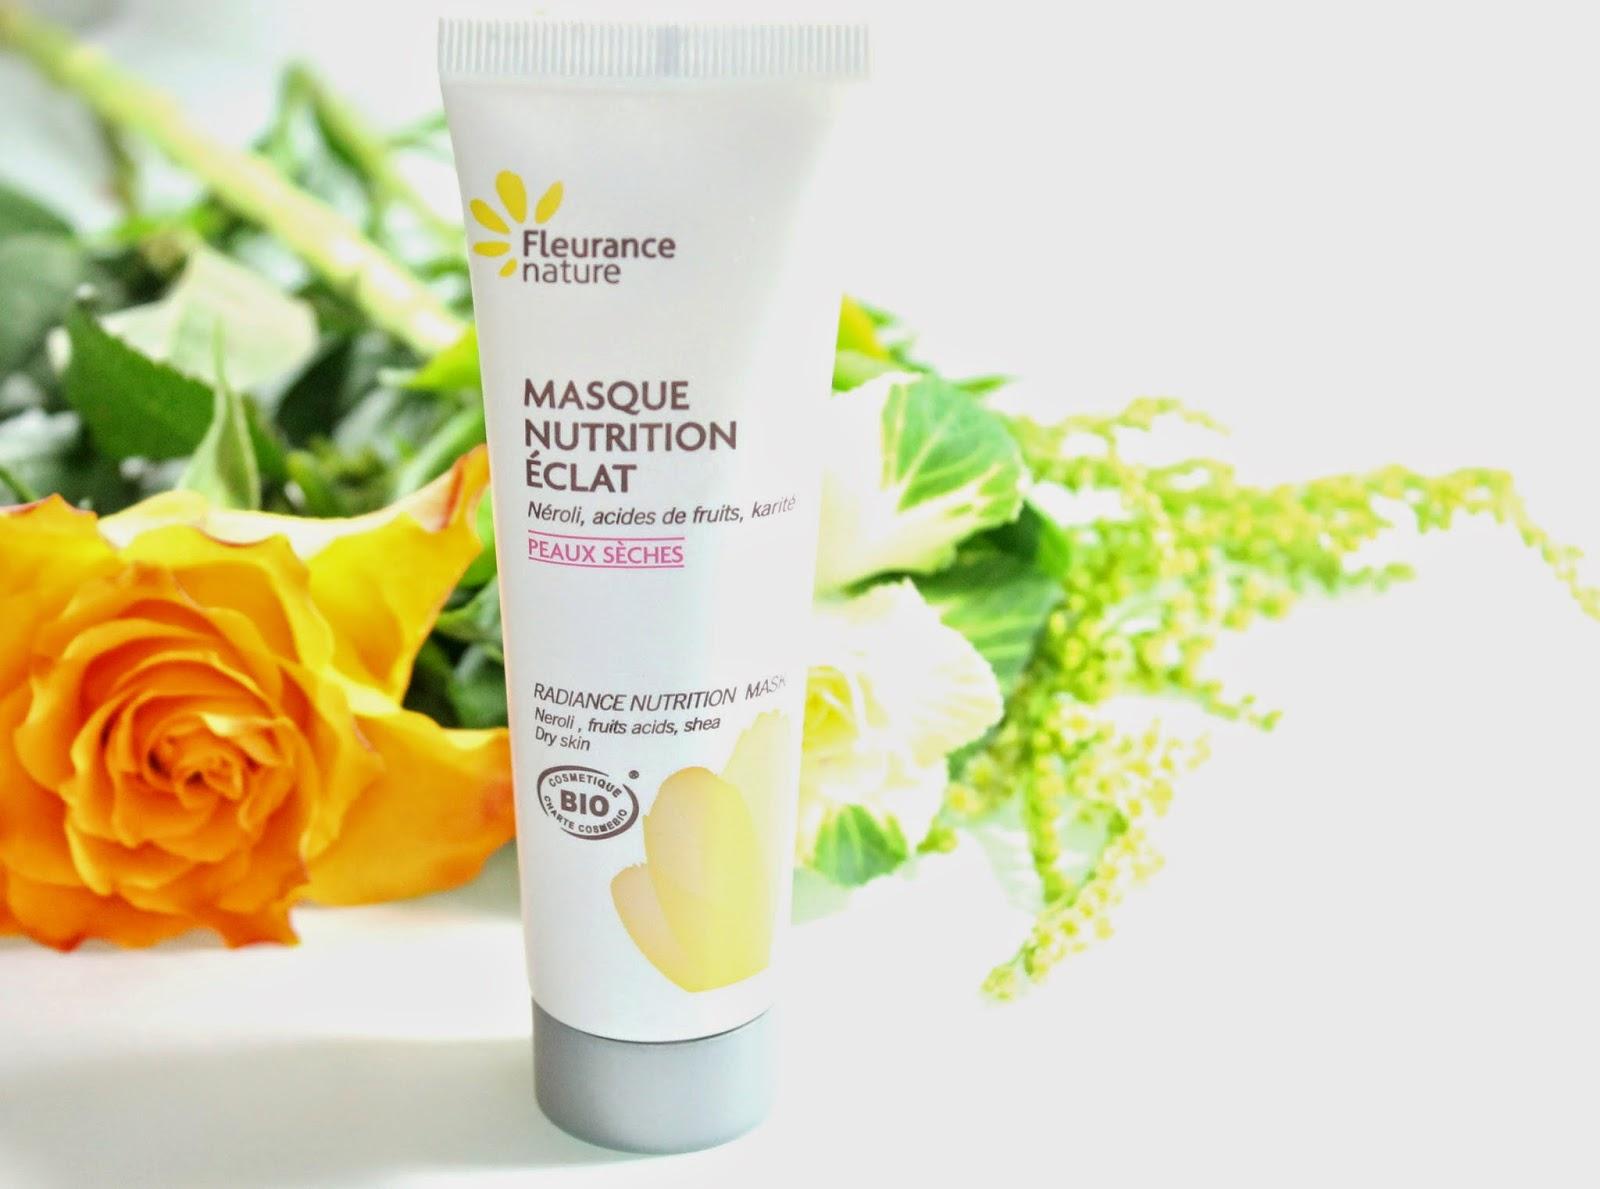 Beaut brune masque nutrition eclat fleurance nature for Fleurance nature